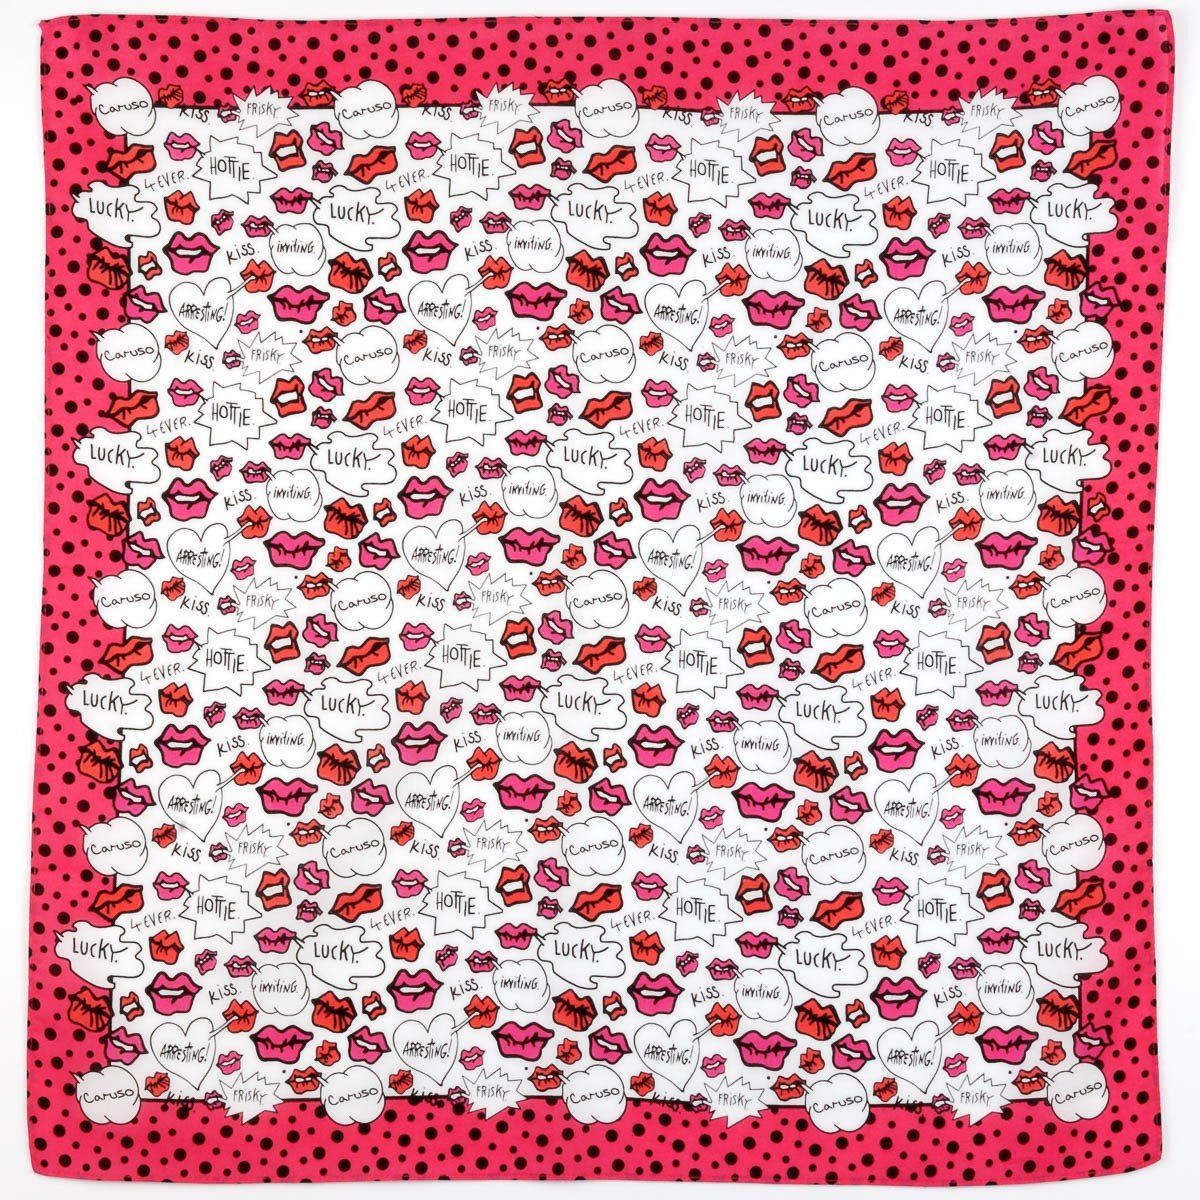 Armando Caruso Kiss handkerchiefs 3 units